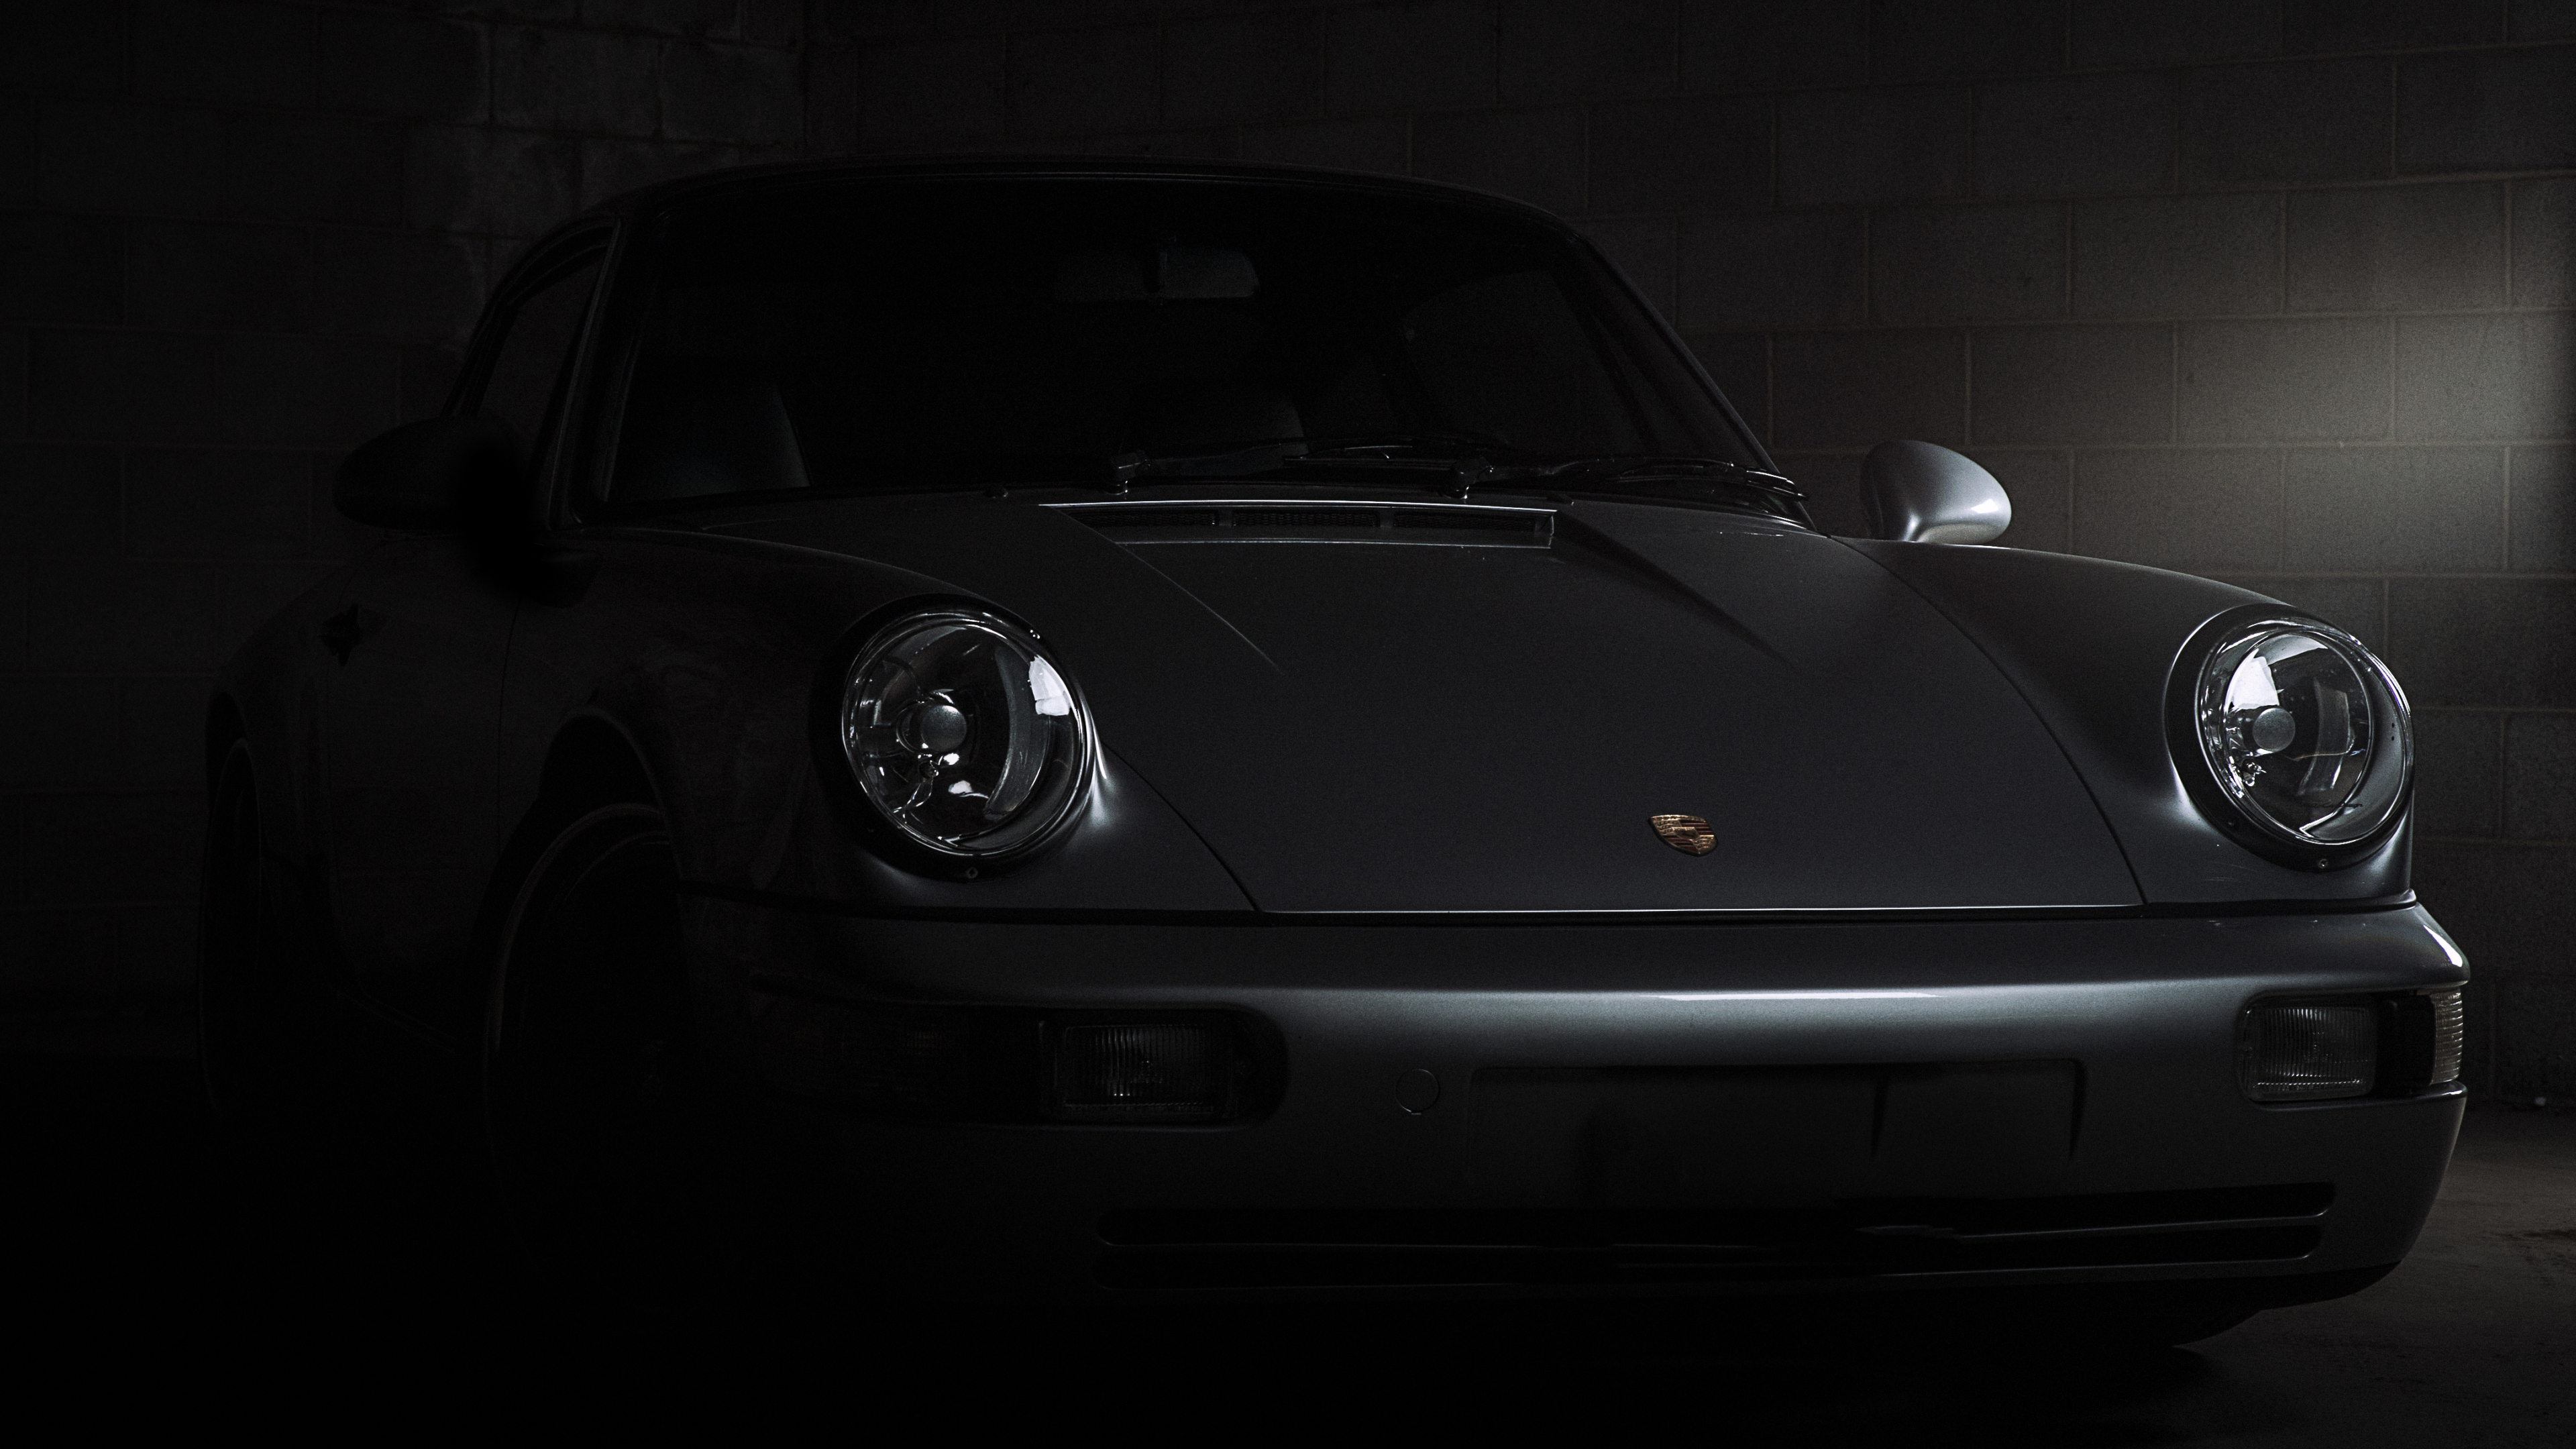 3840x2160 Porsche 911 Carrera Black 4k Wallpaper Hd Cars 4k